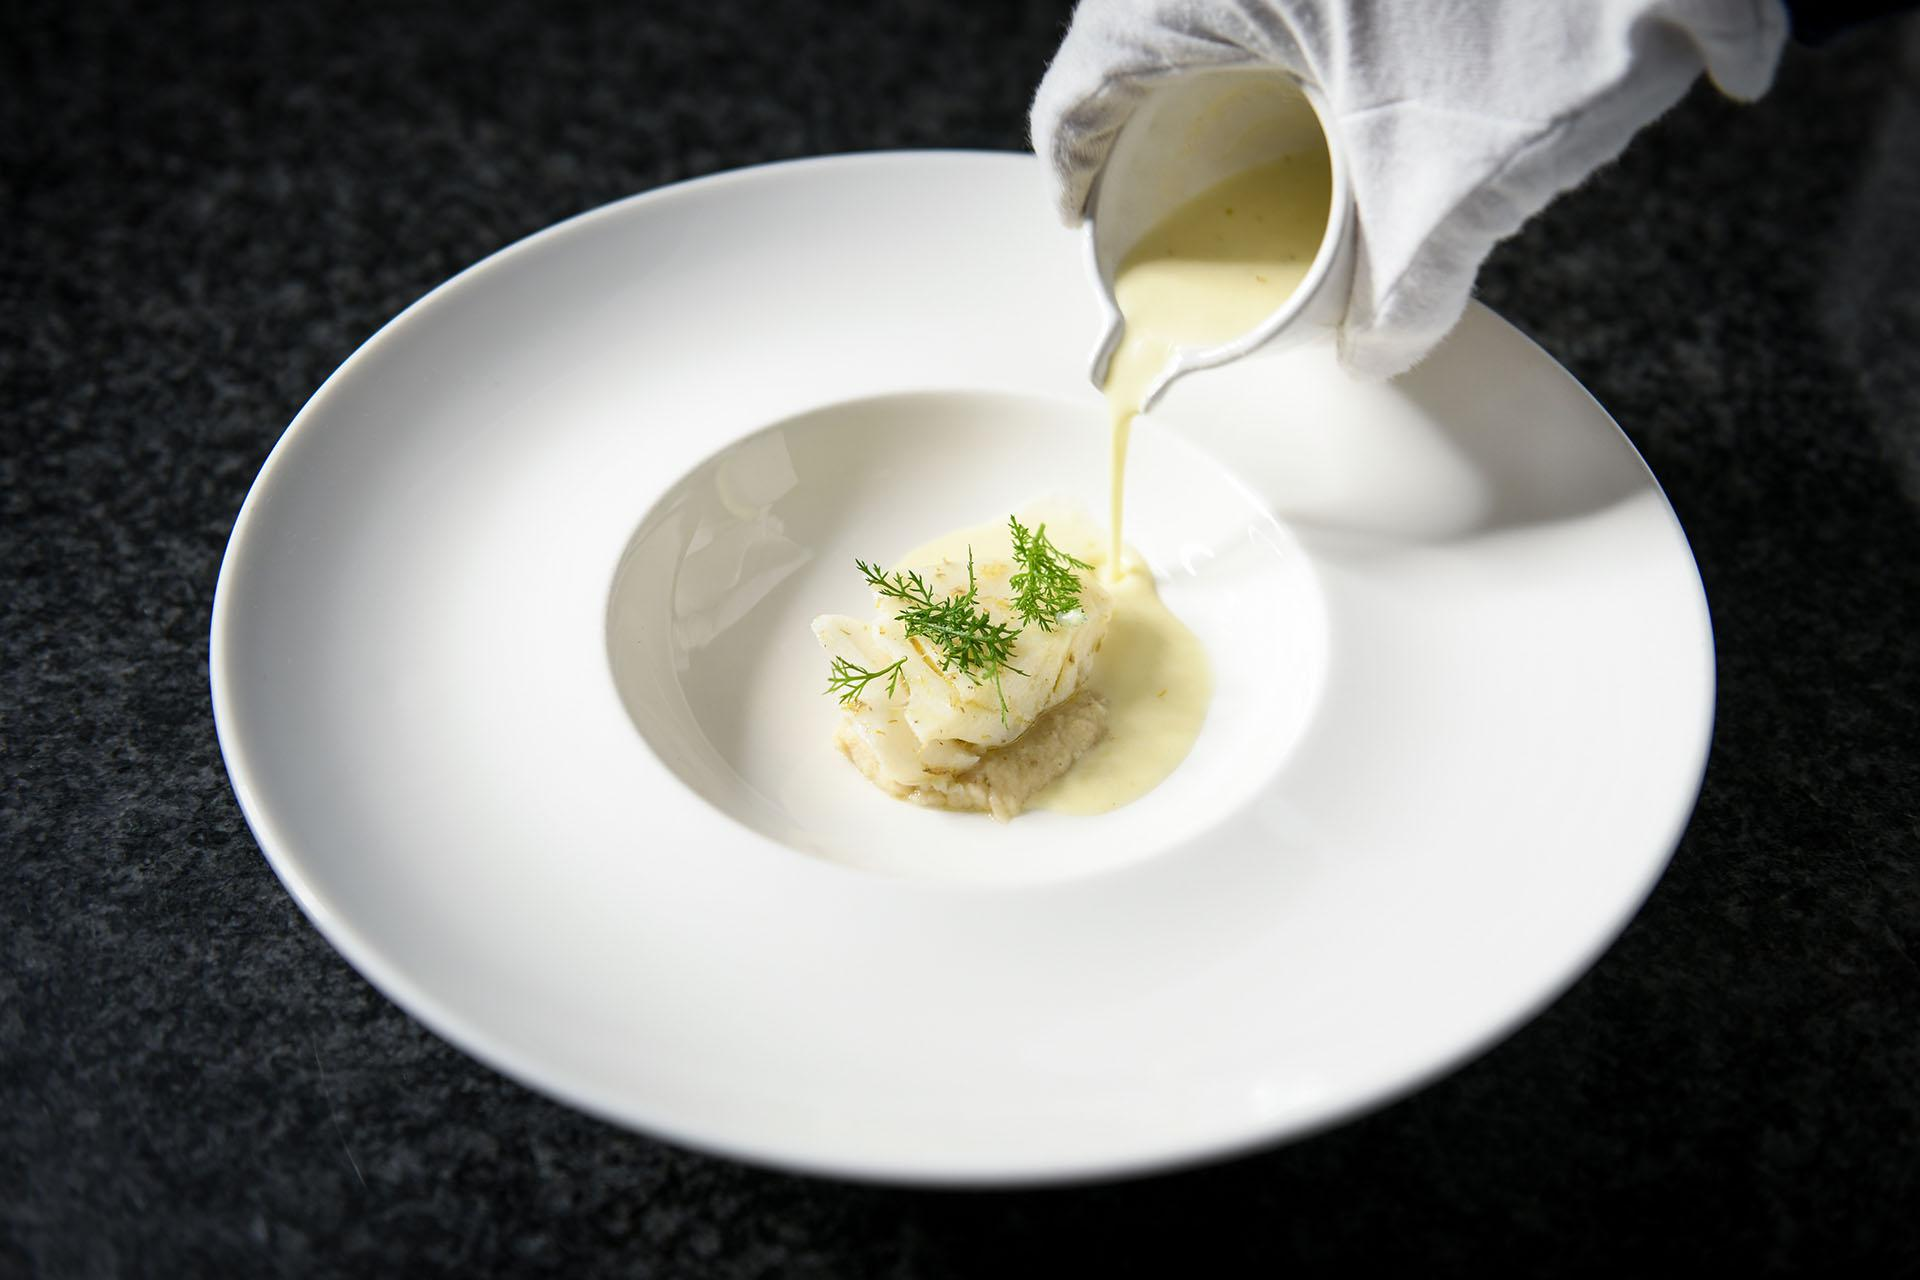 Ristorante Tilia - Chris Oberhammer - menu